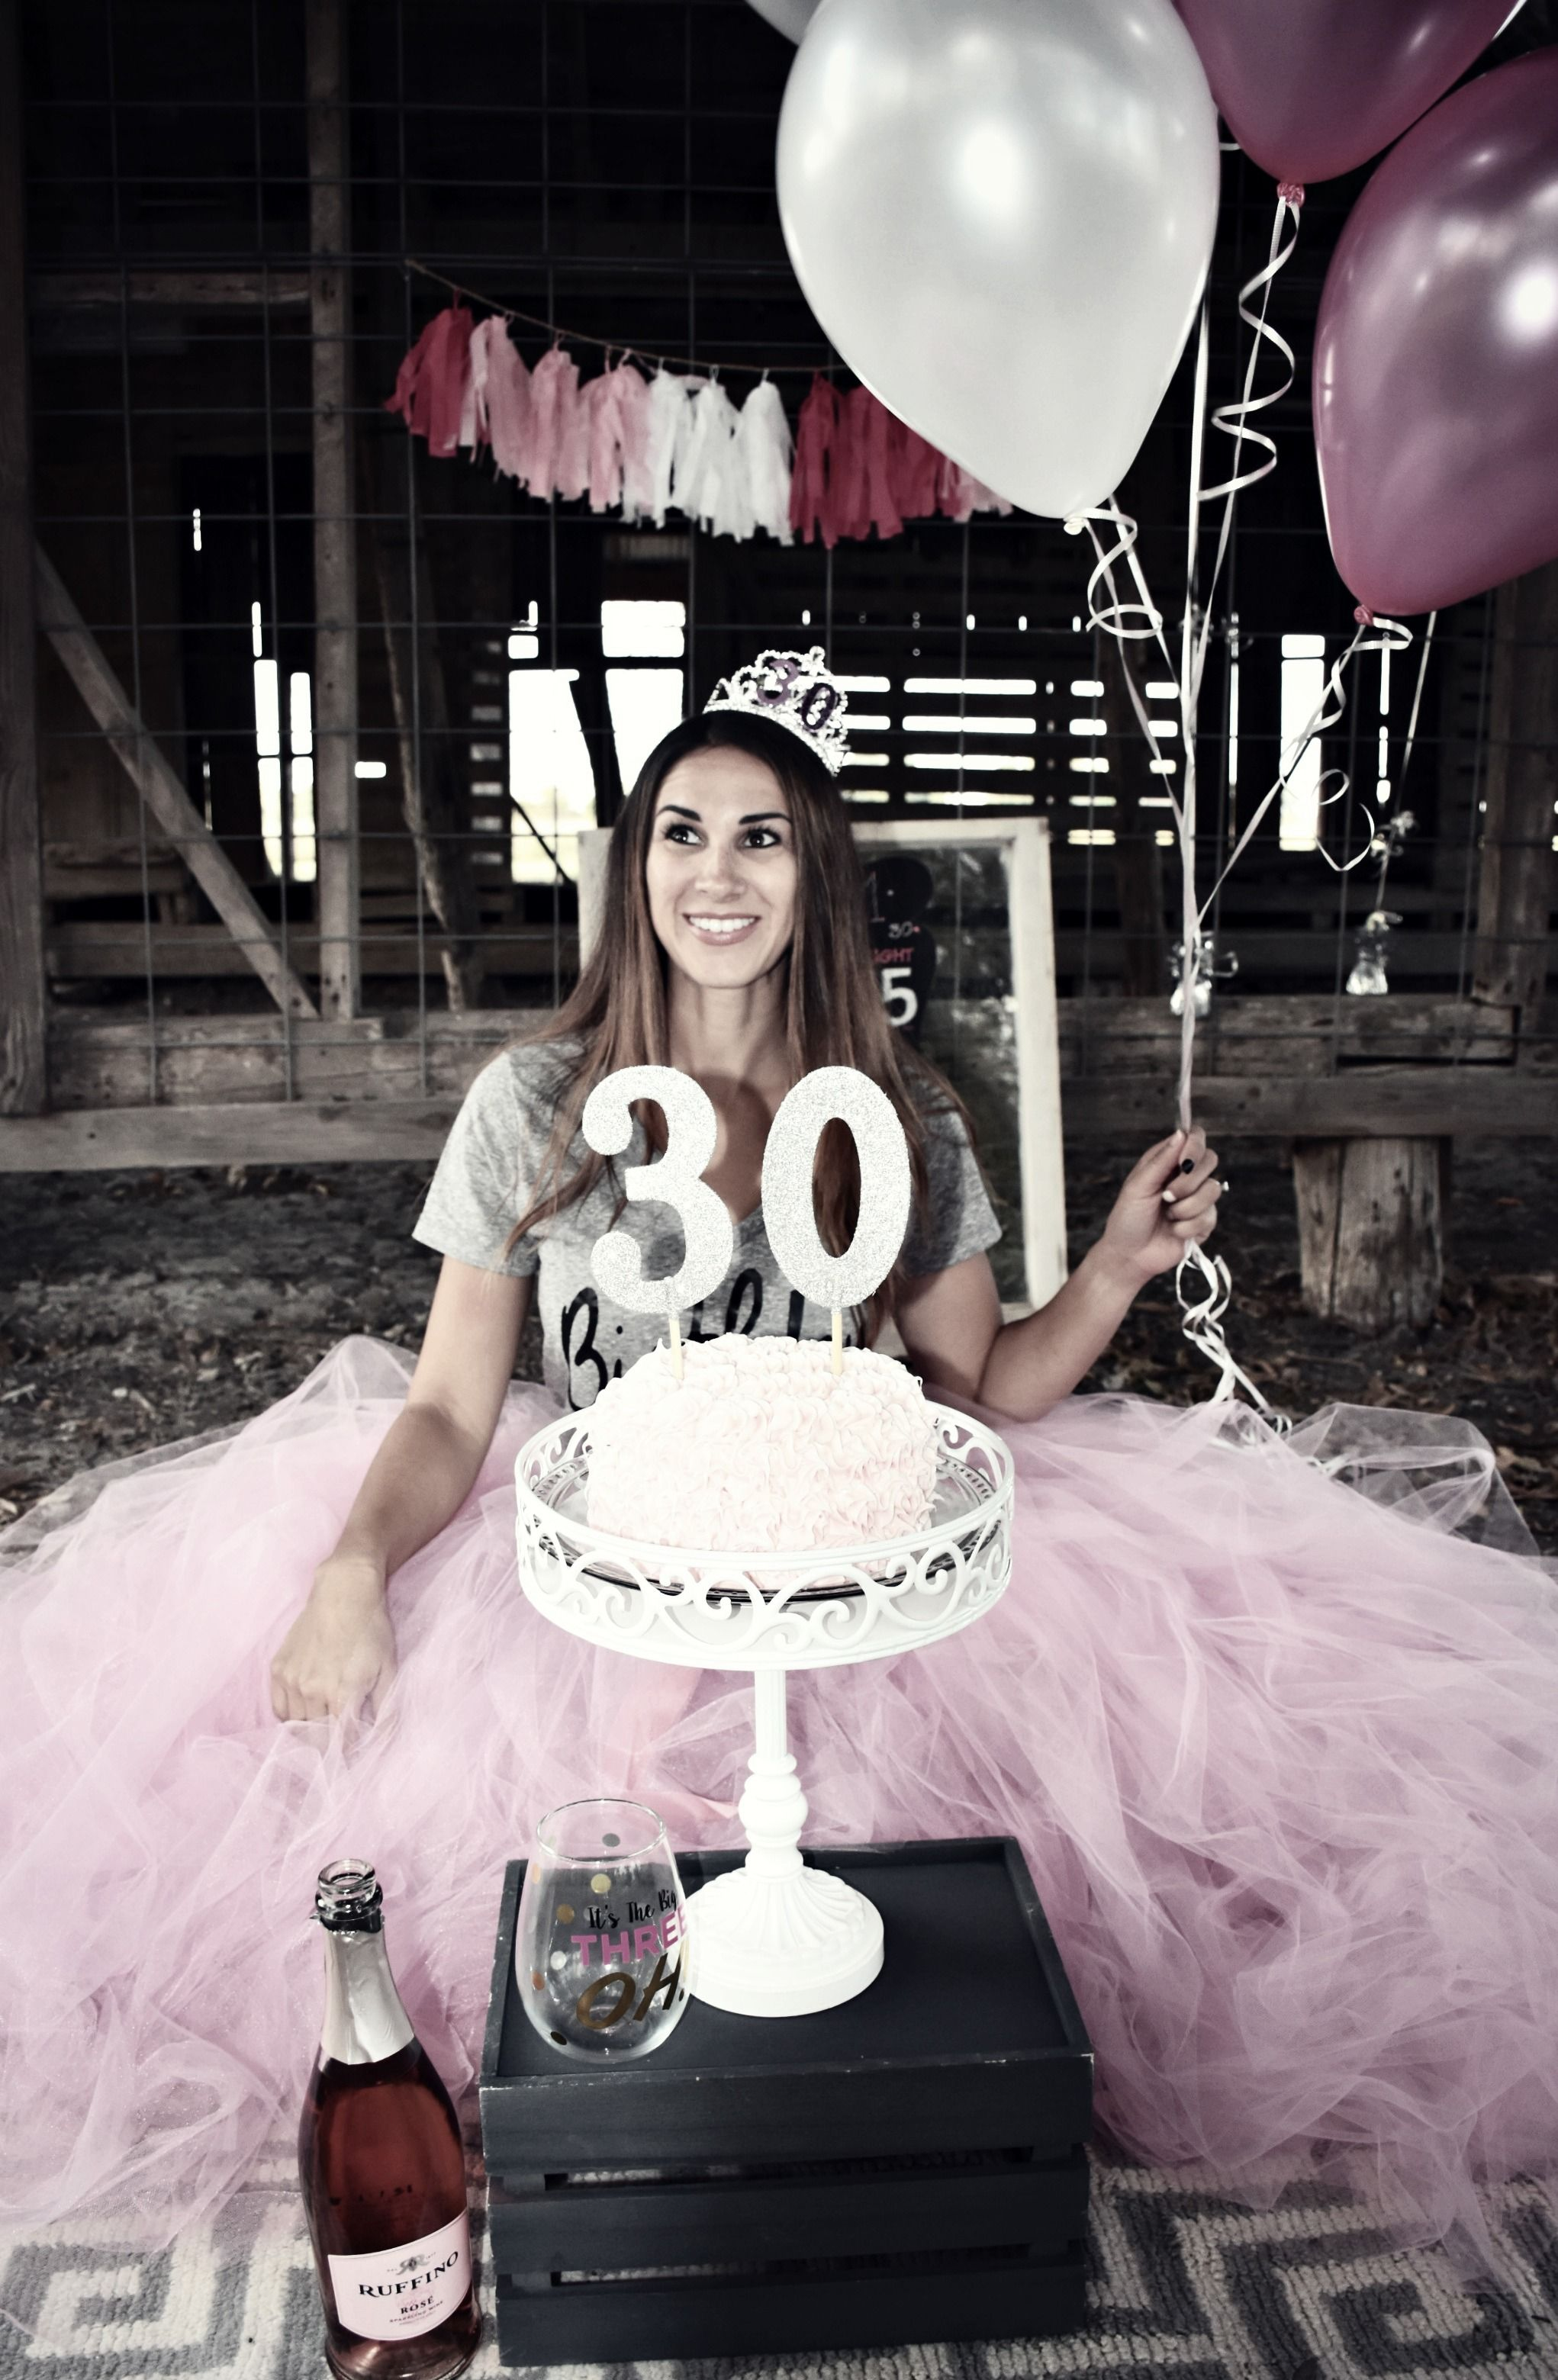 30th Smash Cake & Champagne Pretty in Pink, Happy Birthday